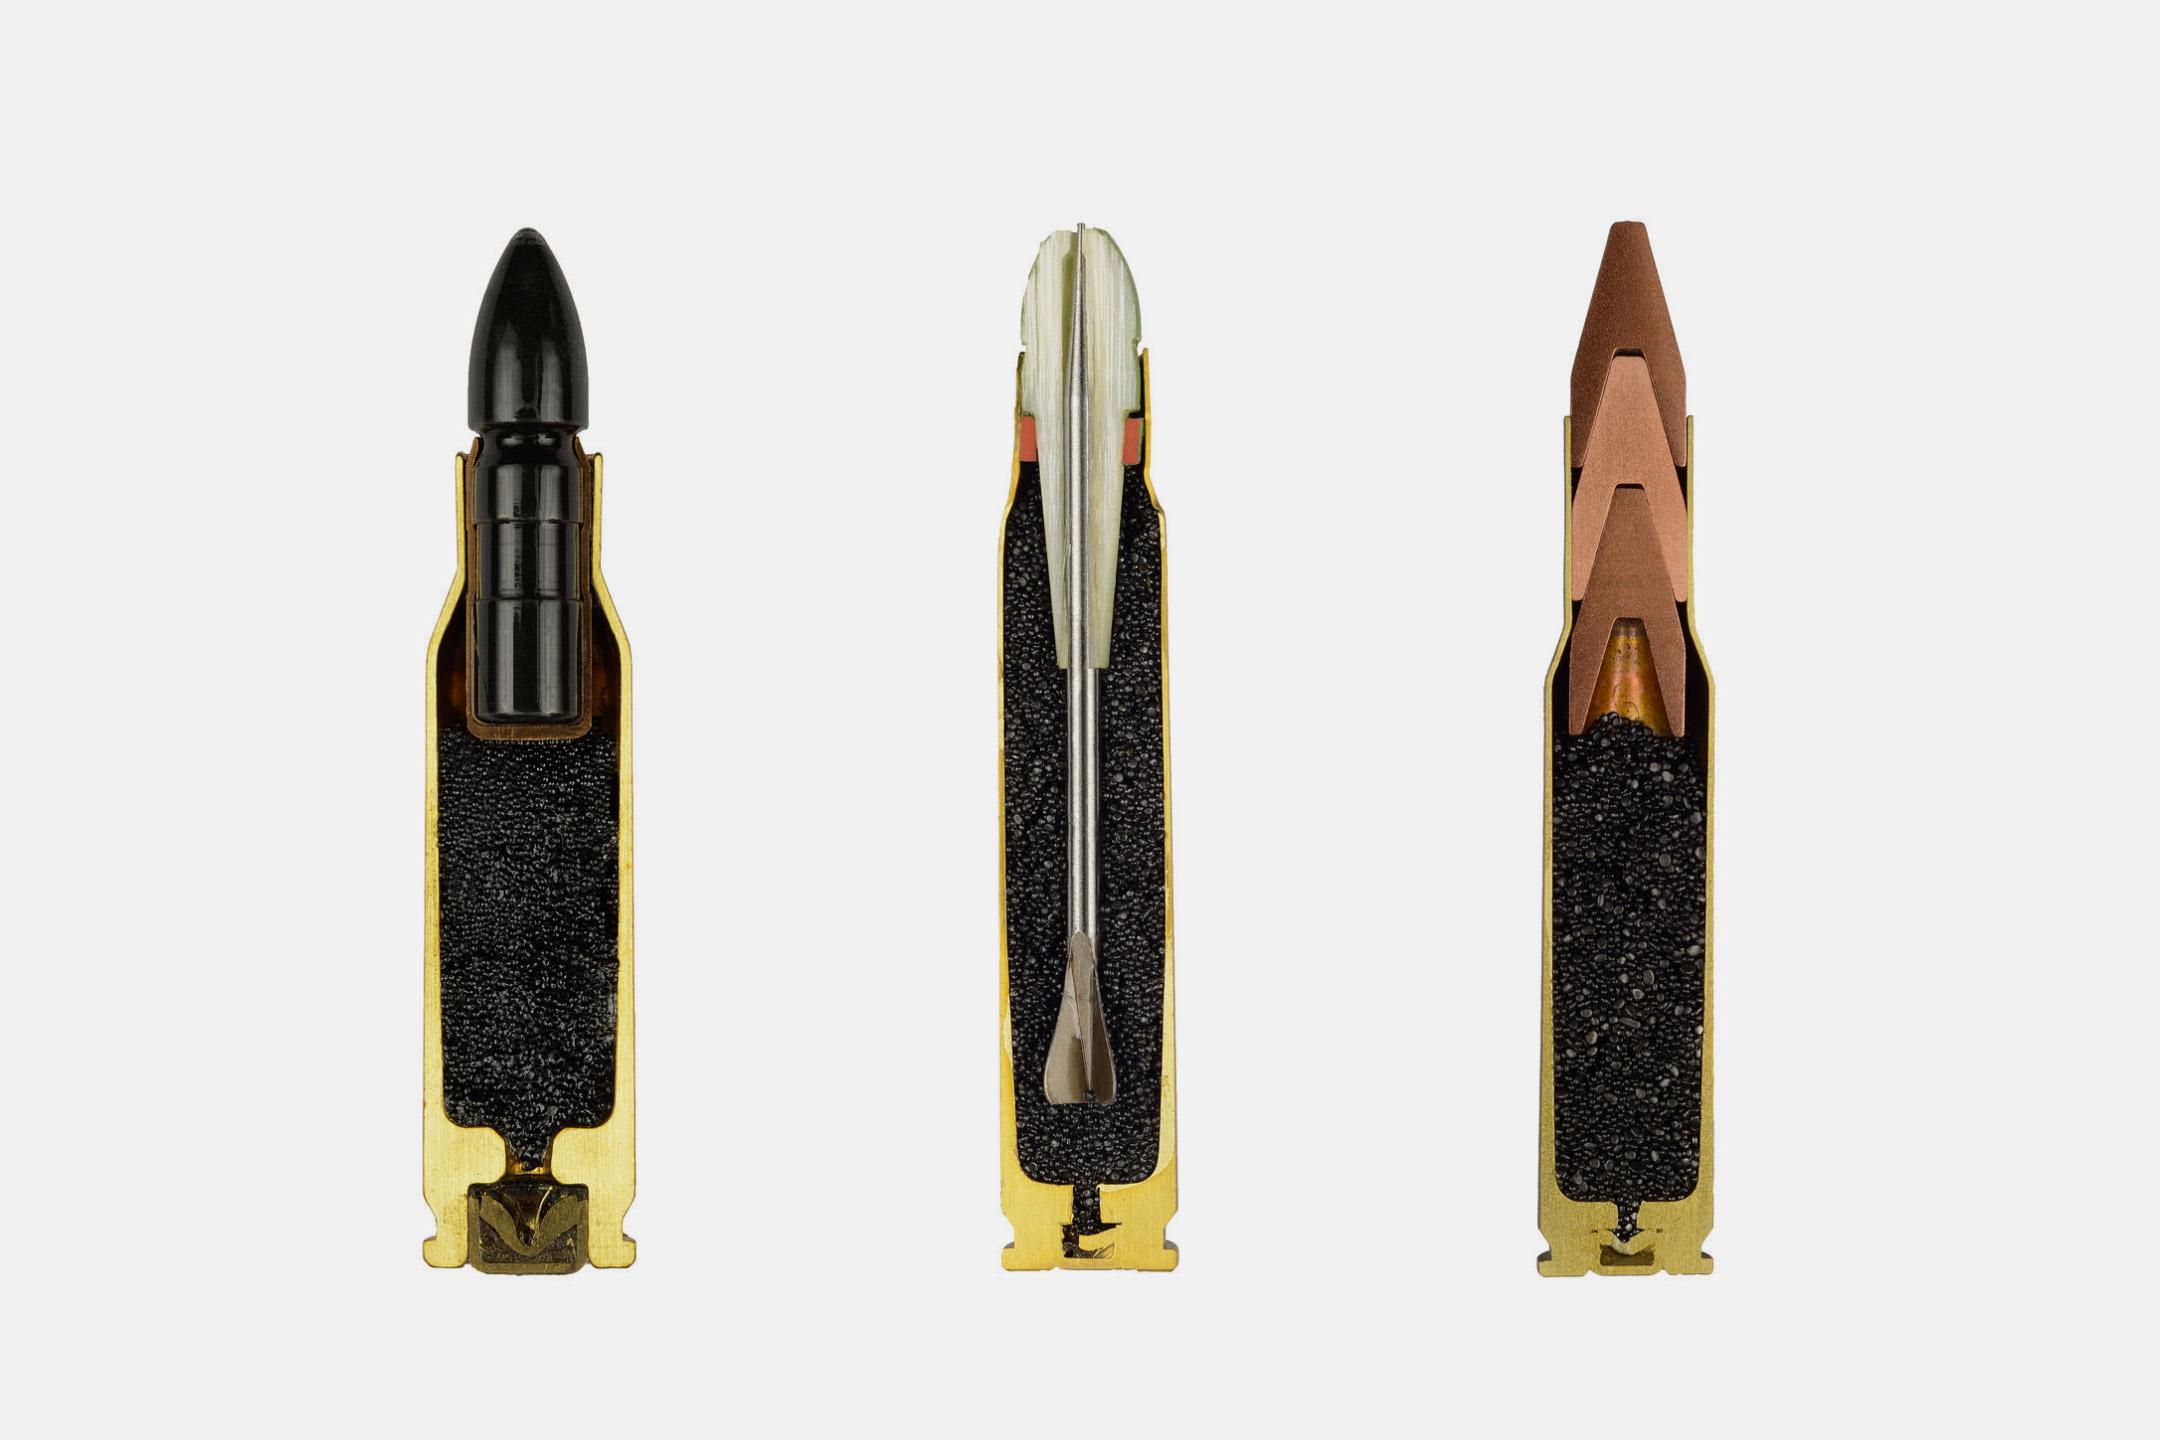 sabine-pearlman-ammo-03